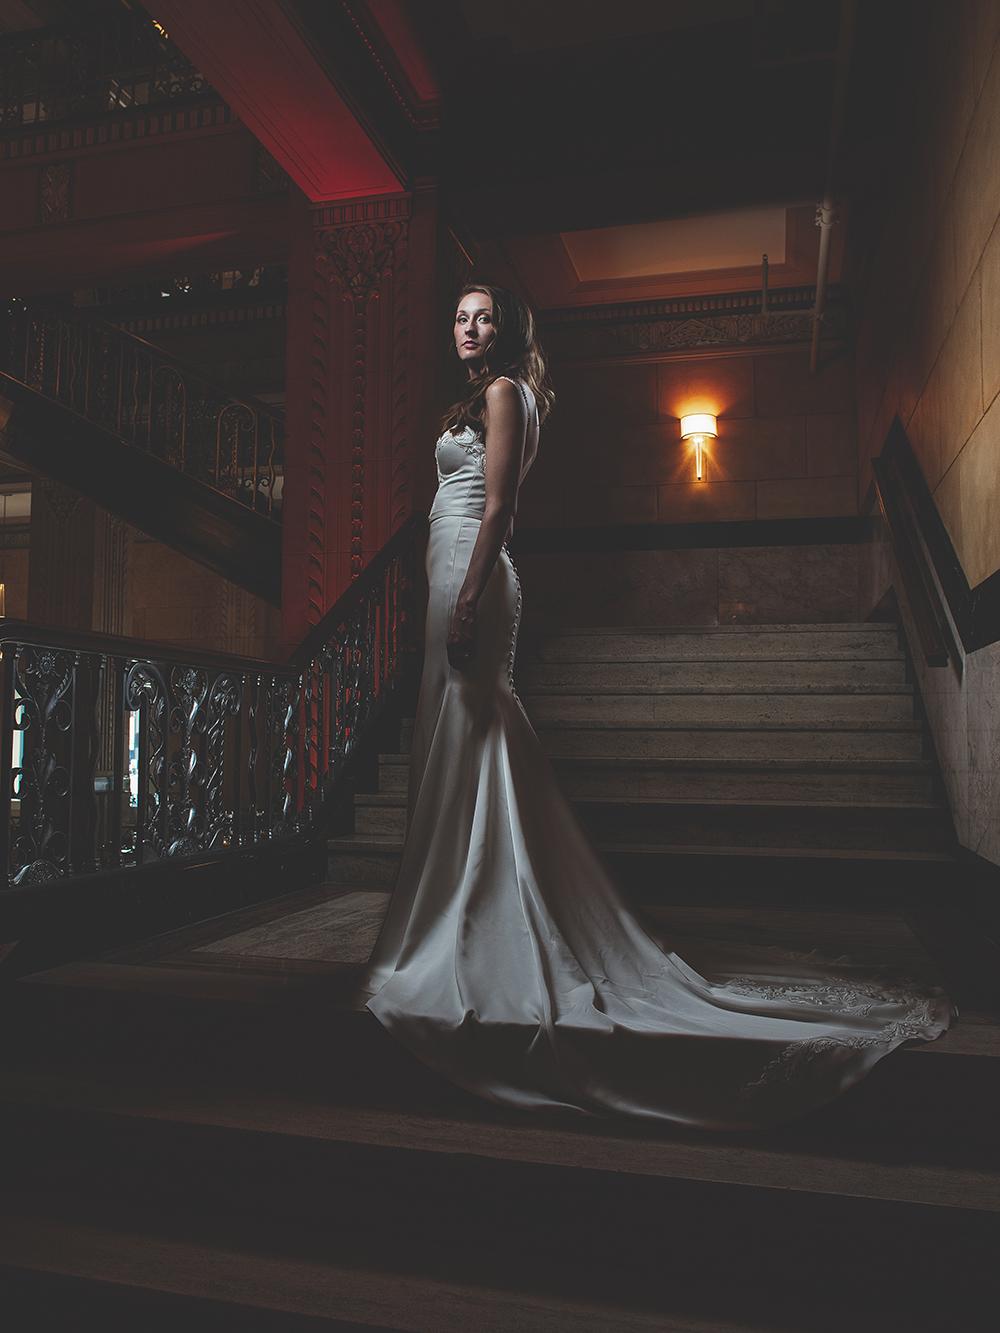 the-grand-hall-kansas-city-wedding-photographer-jason-domingues-photography-kc-anna-cory-blog-post-_0035.JPG